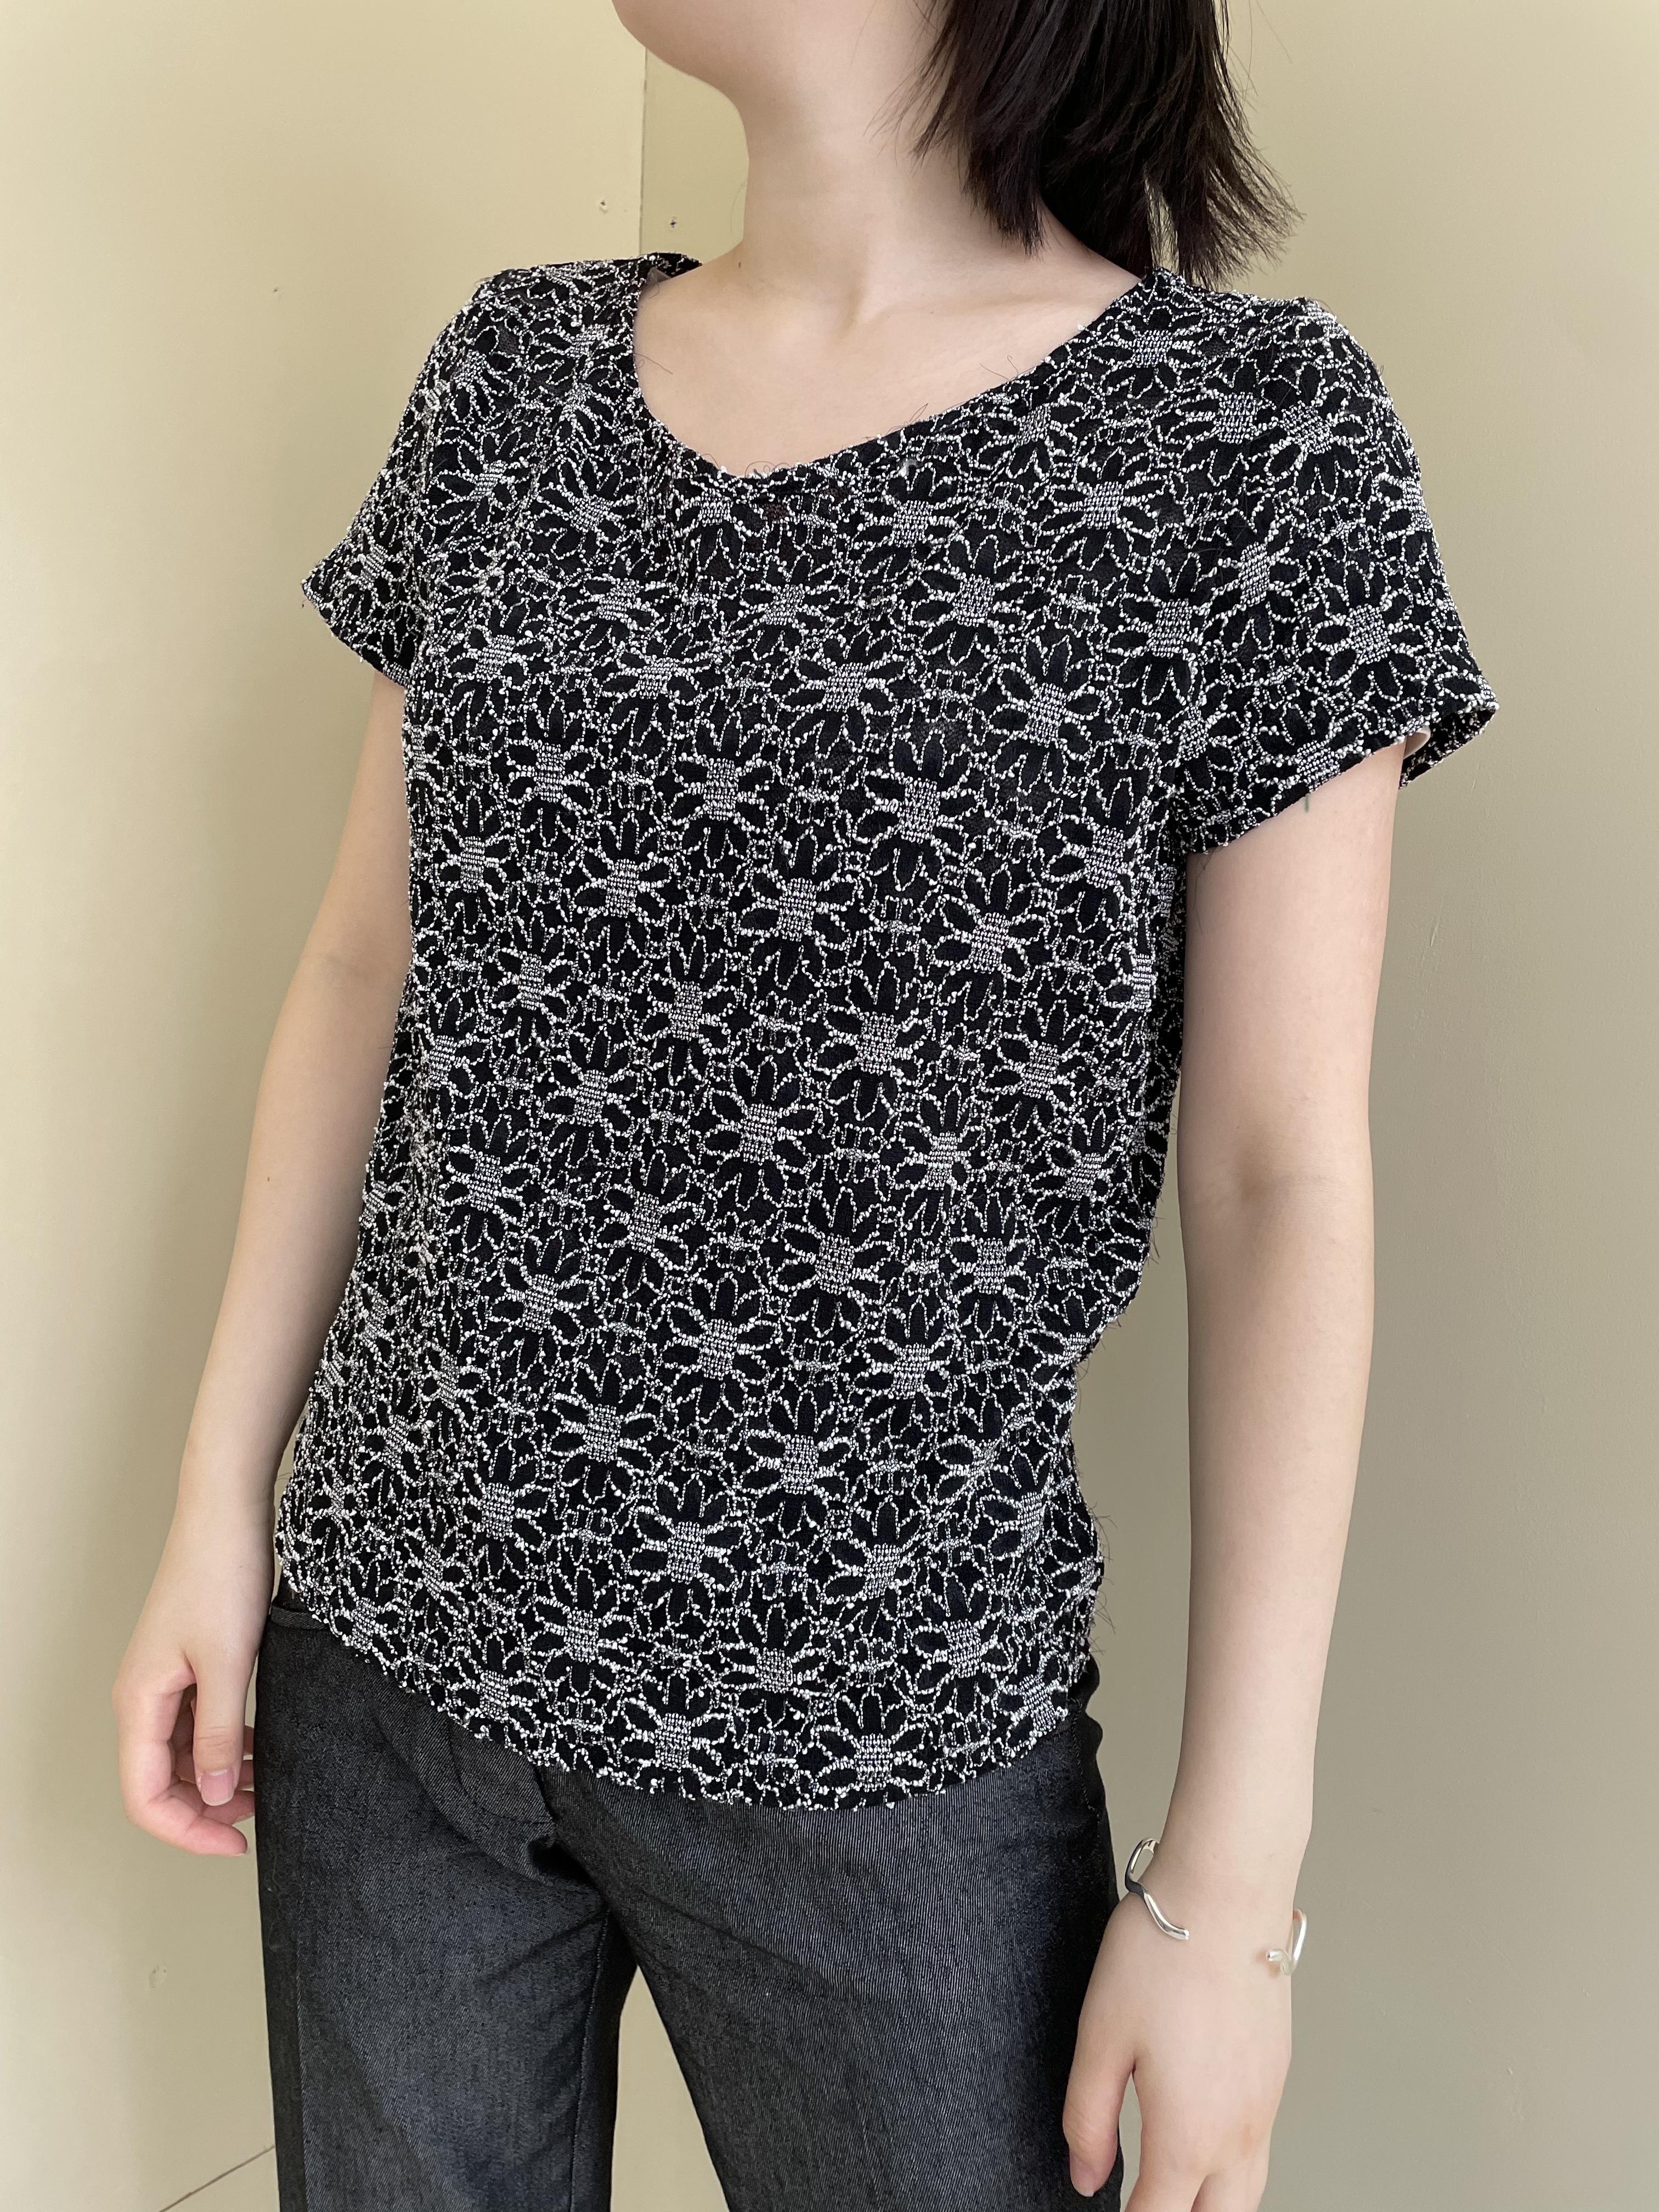 lace design tops / 7SSTP13-07